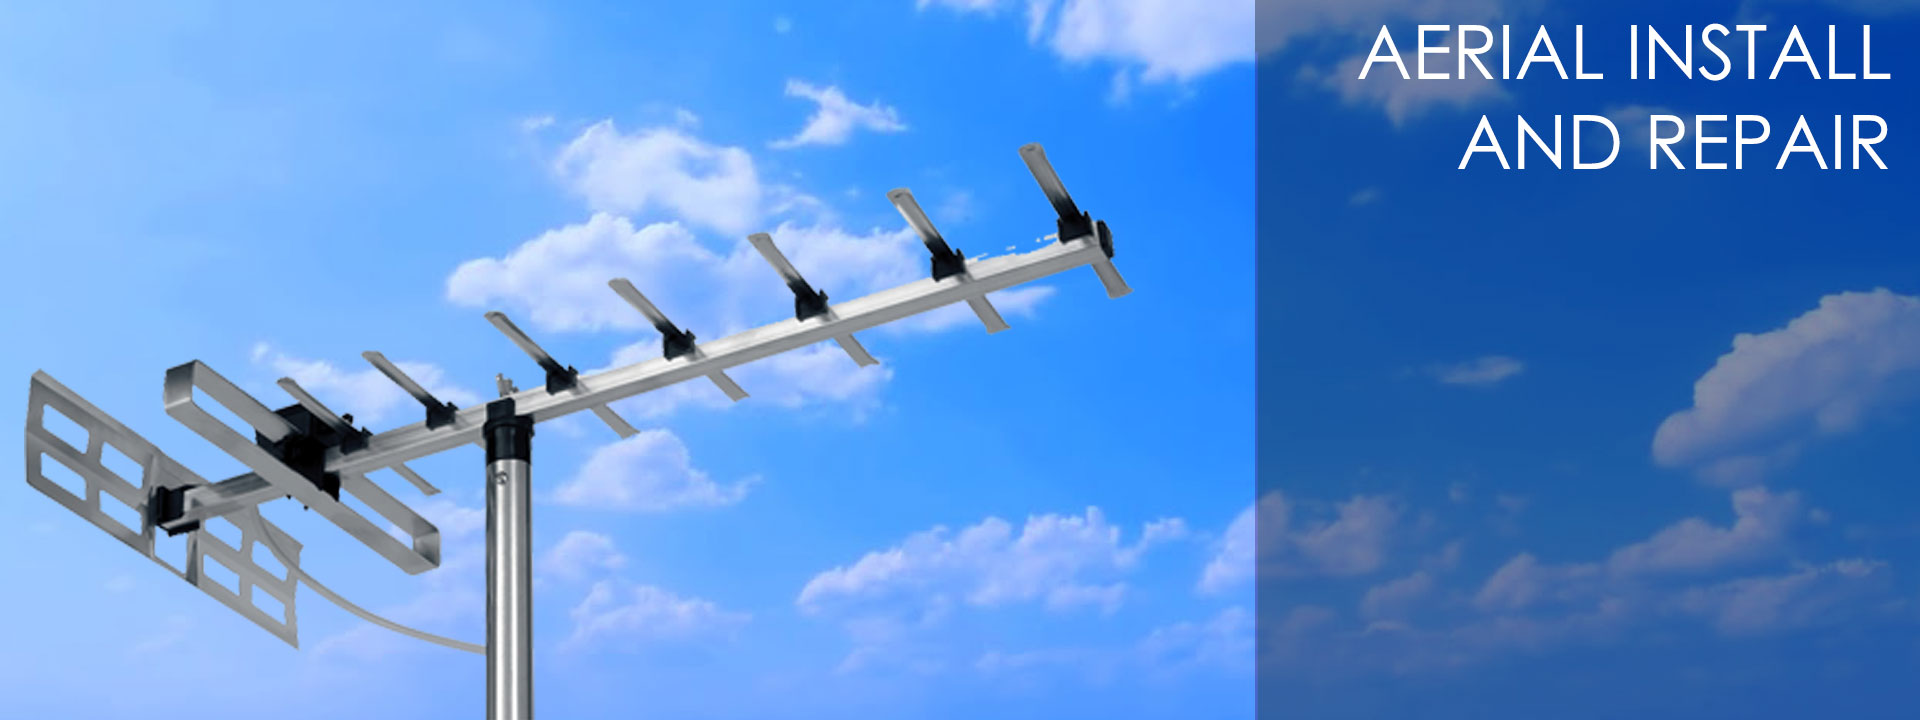 Aerial Installation and repair